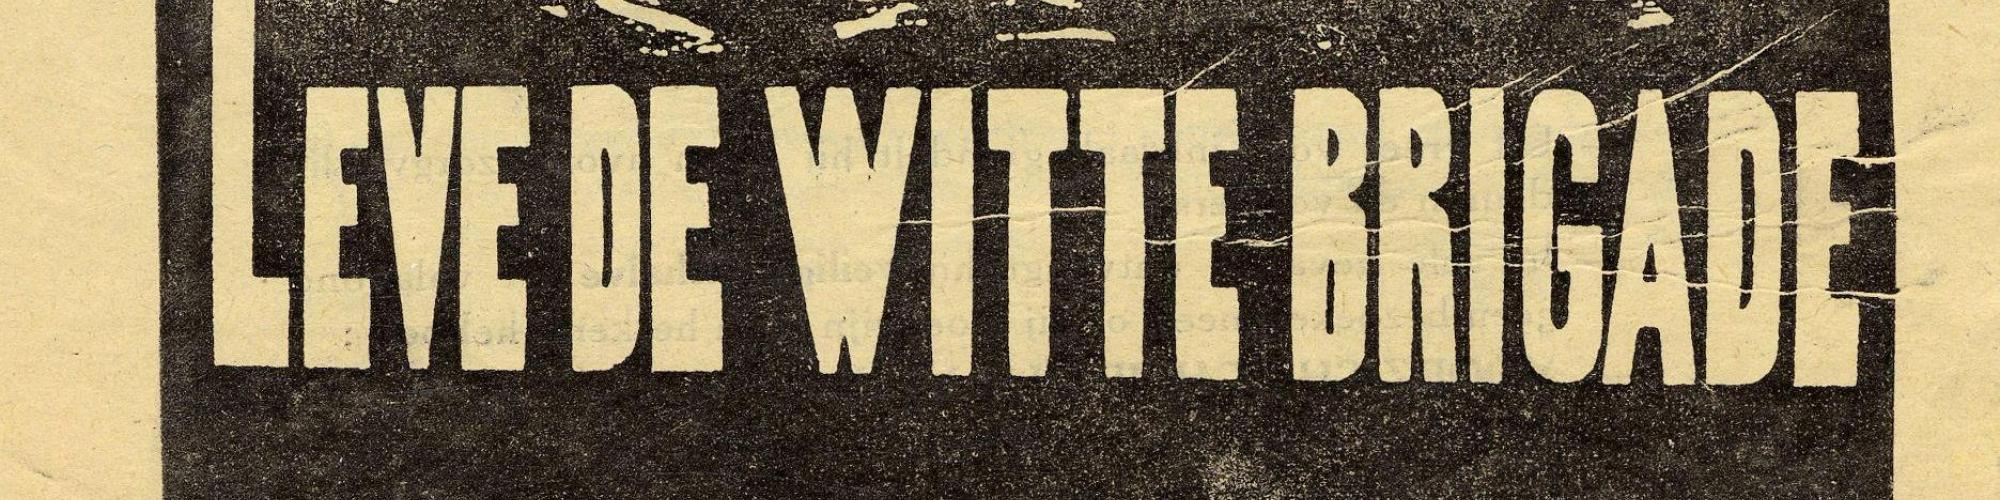 Fonds de la Witte Brigade